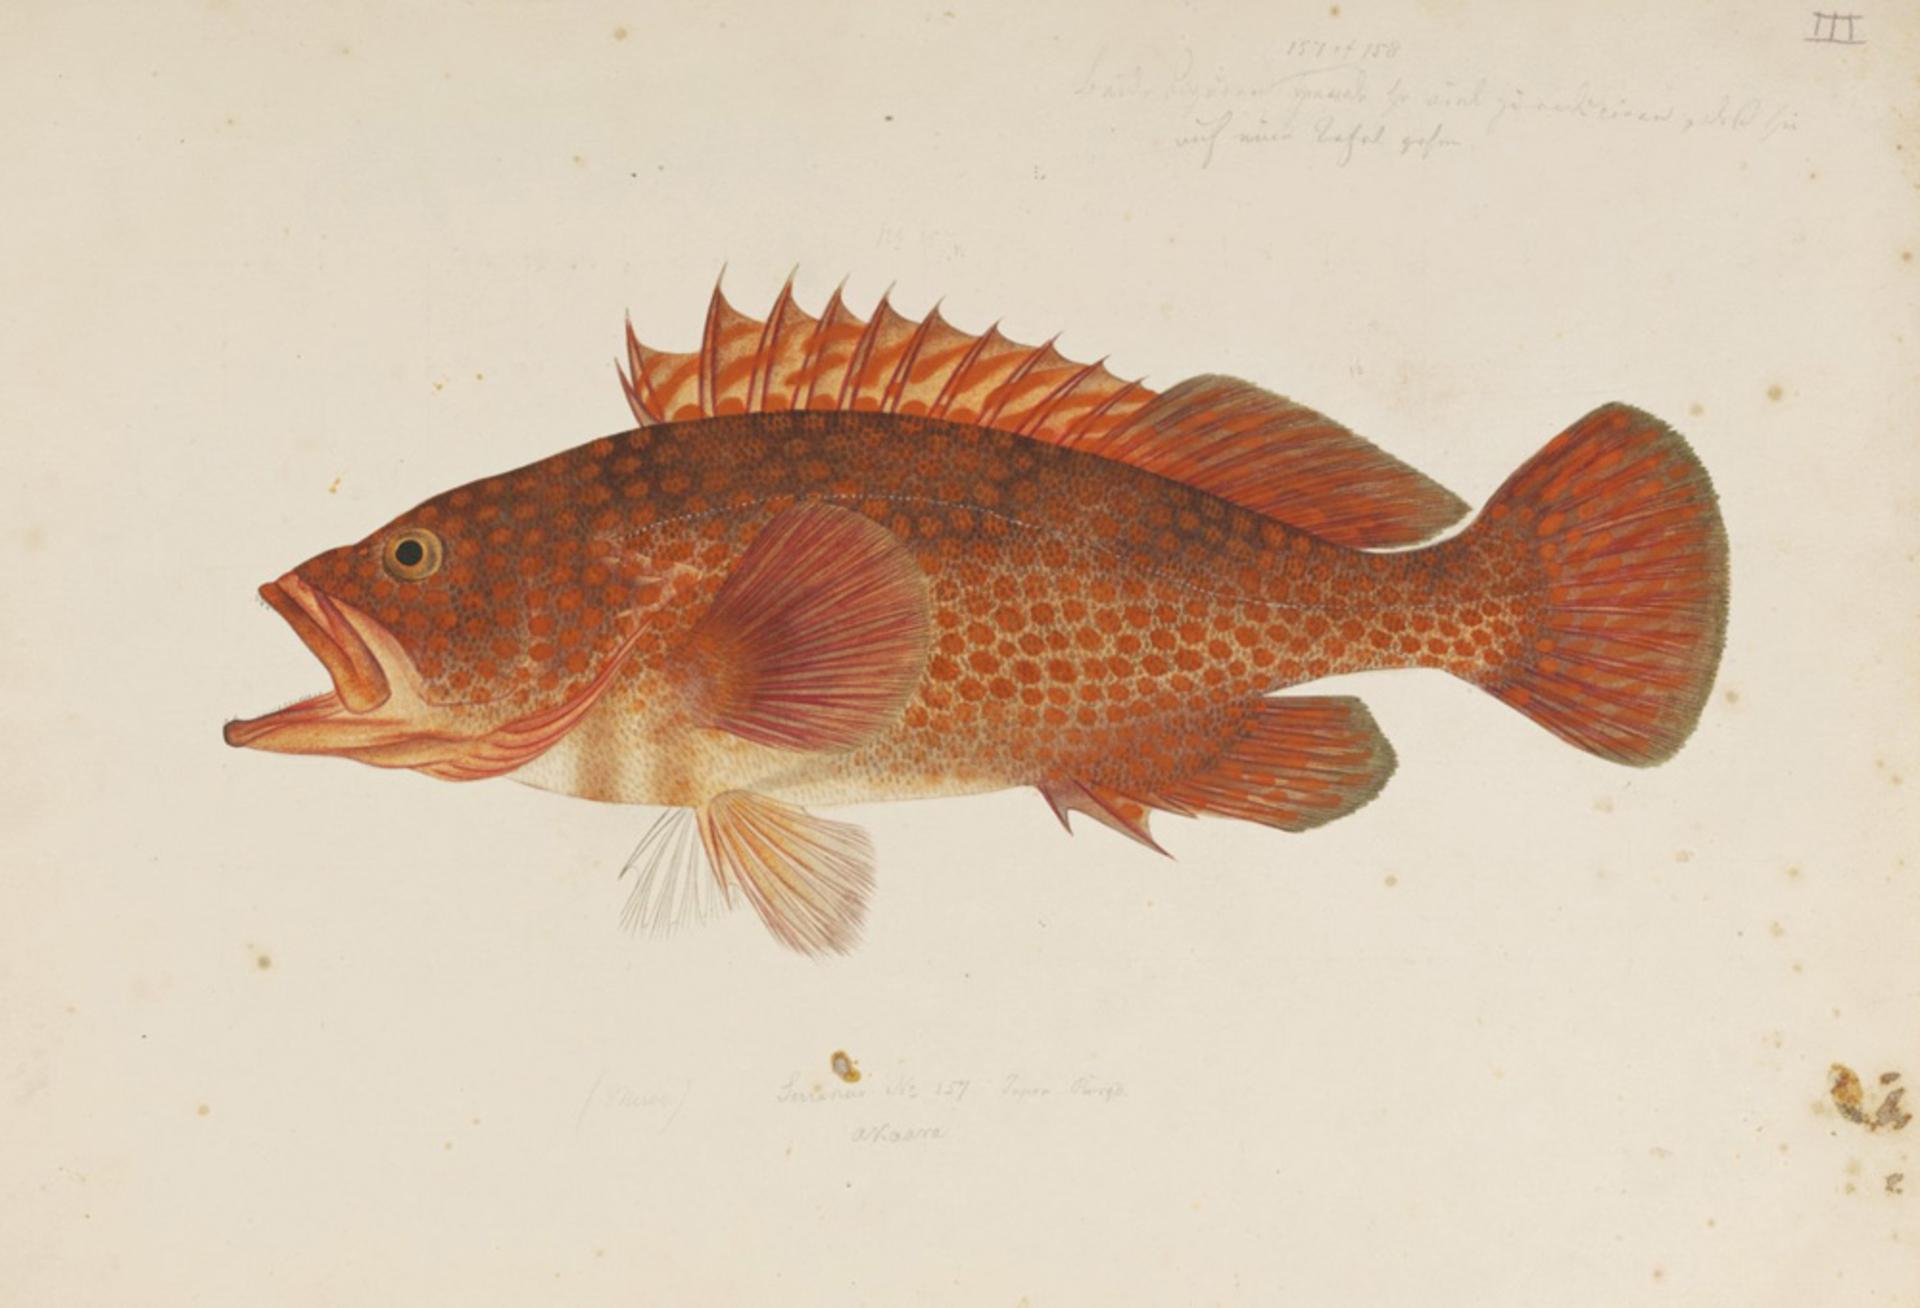 RMNH.ART.227 | Lateolabrax japonicus